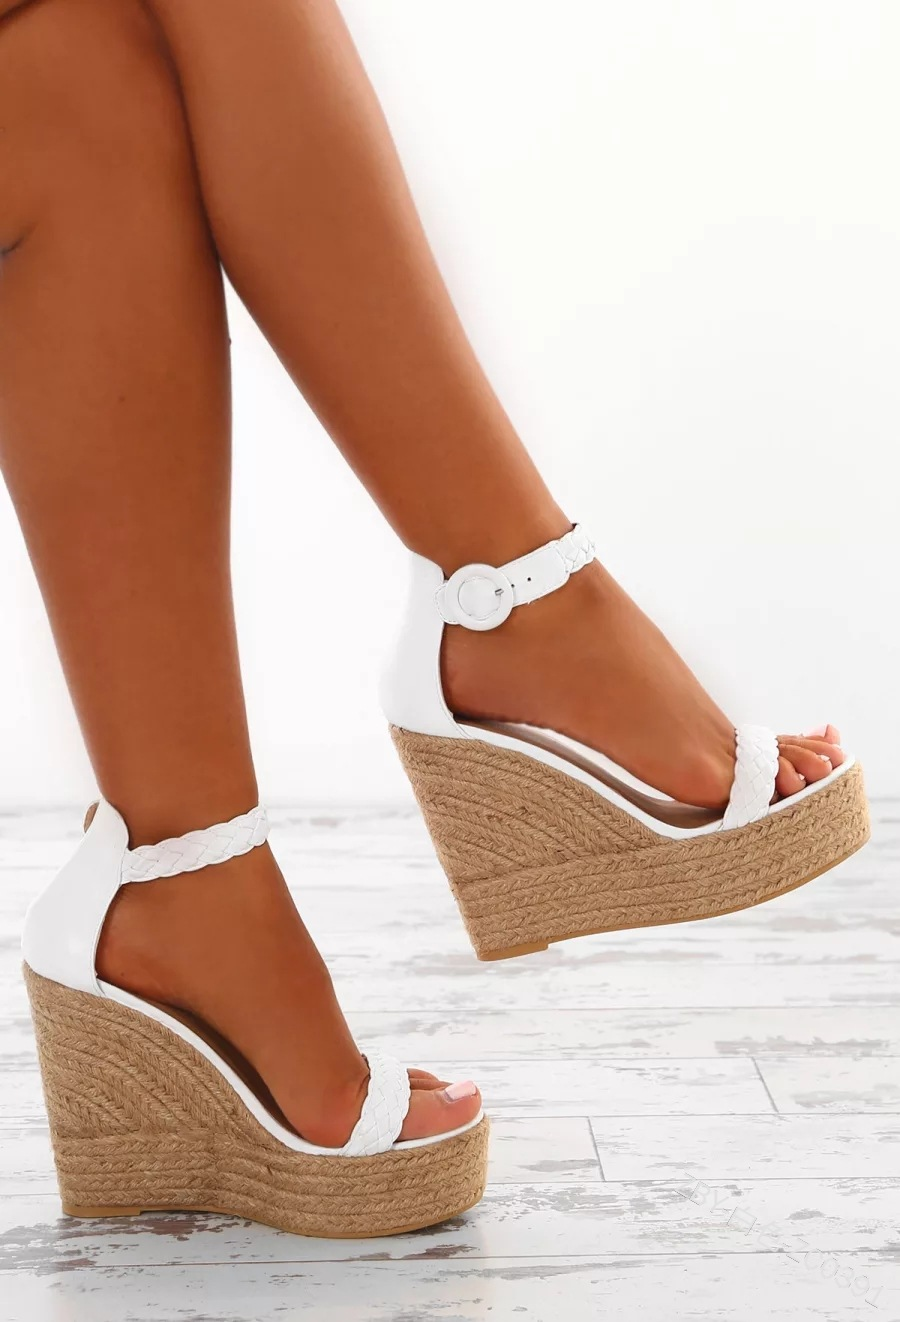 Wedges Shoes Heel-Buckle Platform Mature Women Sandals Open-Toe Summer Solid Dress